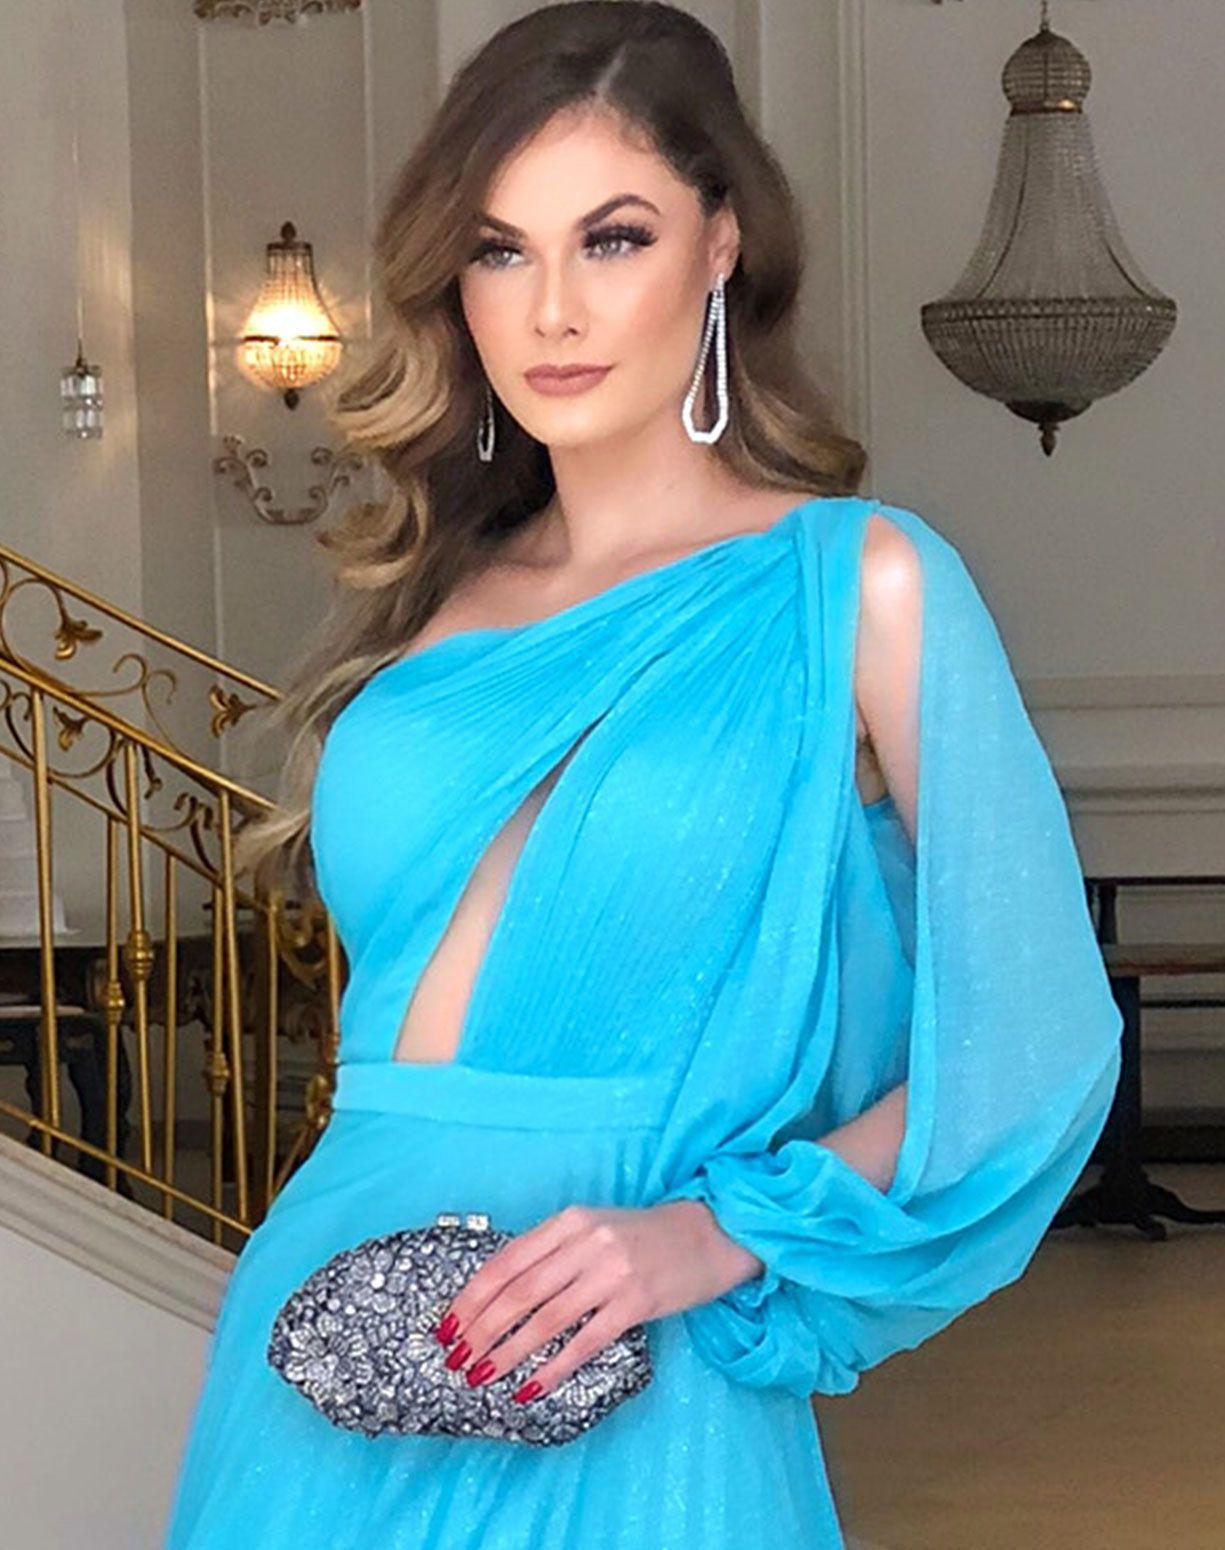 Vestido Tiffany em Tule Glitter Plissado de Um Ombro Só